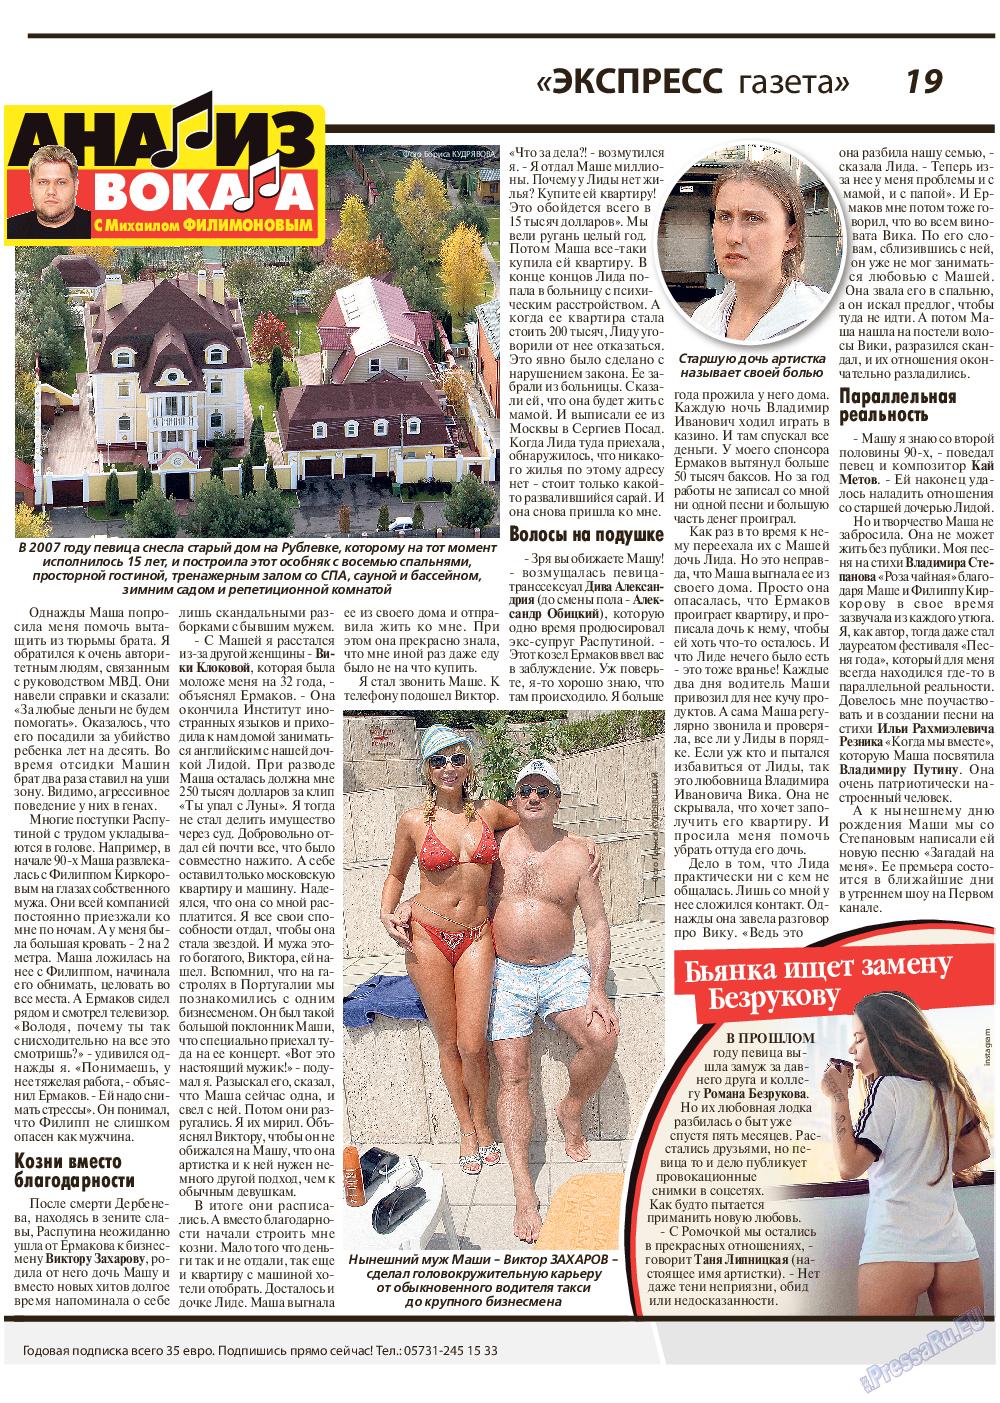 Экспресс газета (газета). 2019 год, номер 6, стр. 19